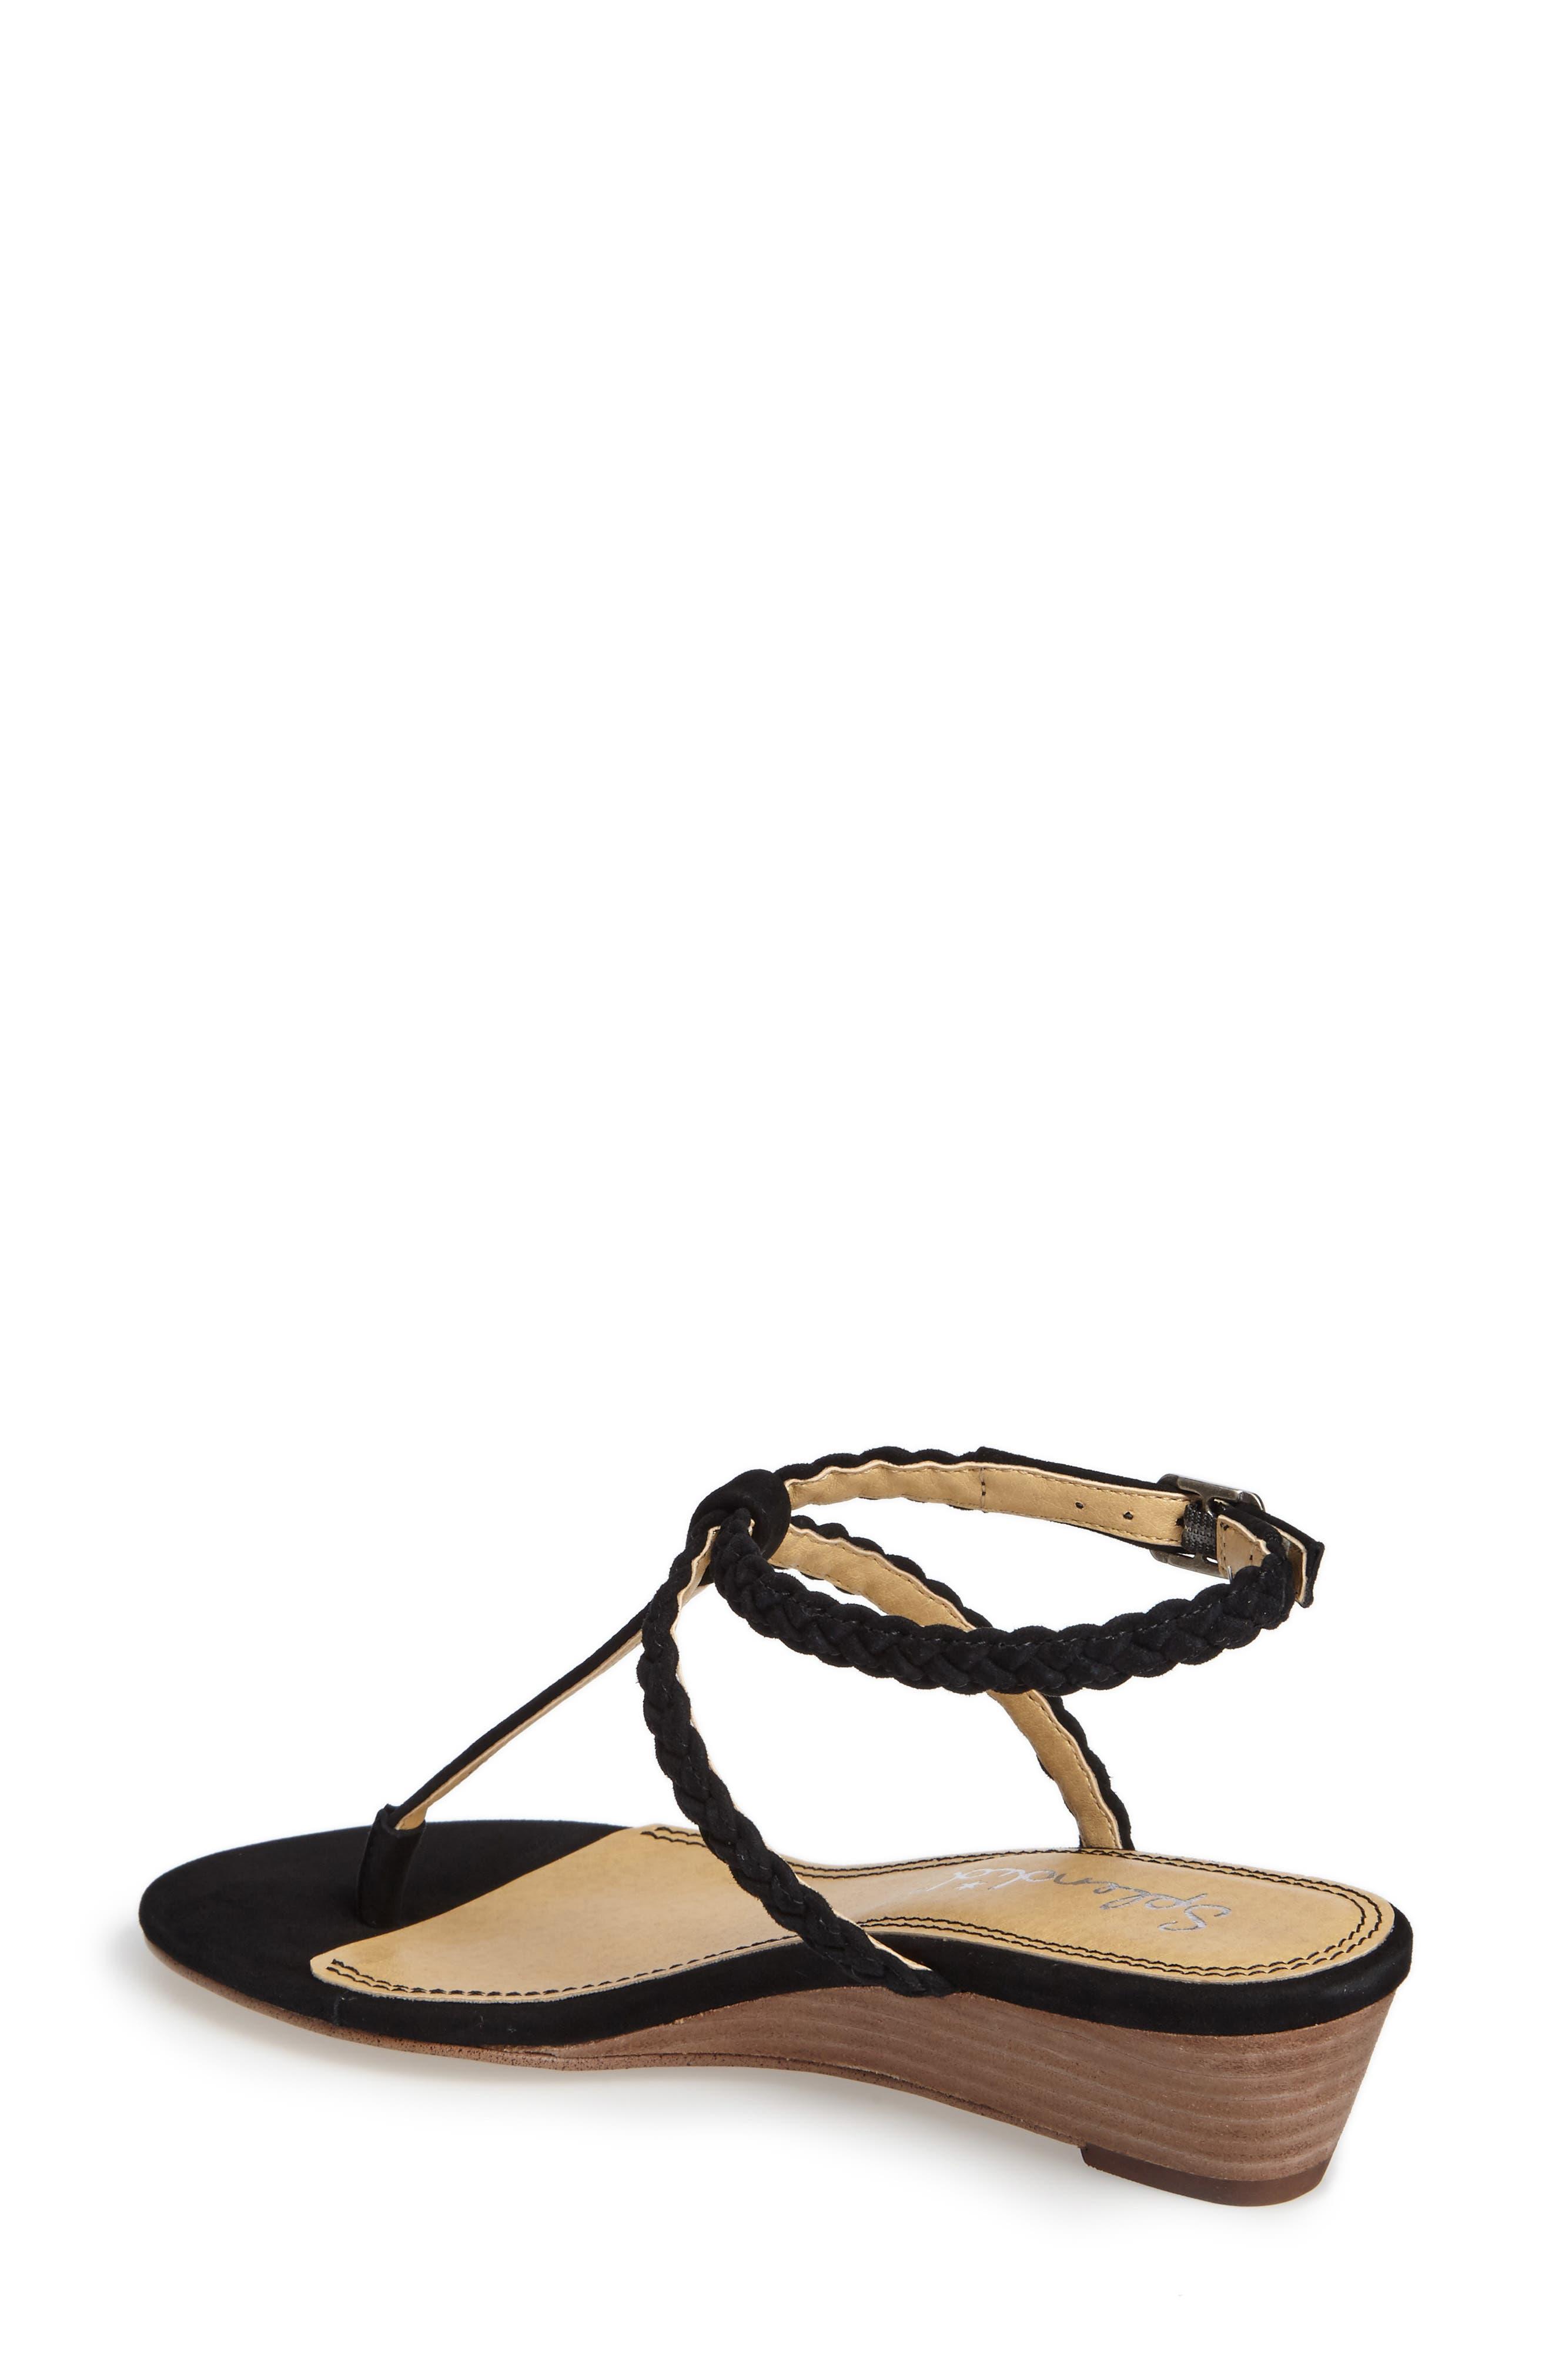 Jadia T-Strap Sandal,                             Alternate thumbnail 2, color,                             Black Suede